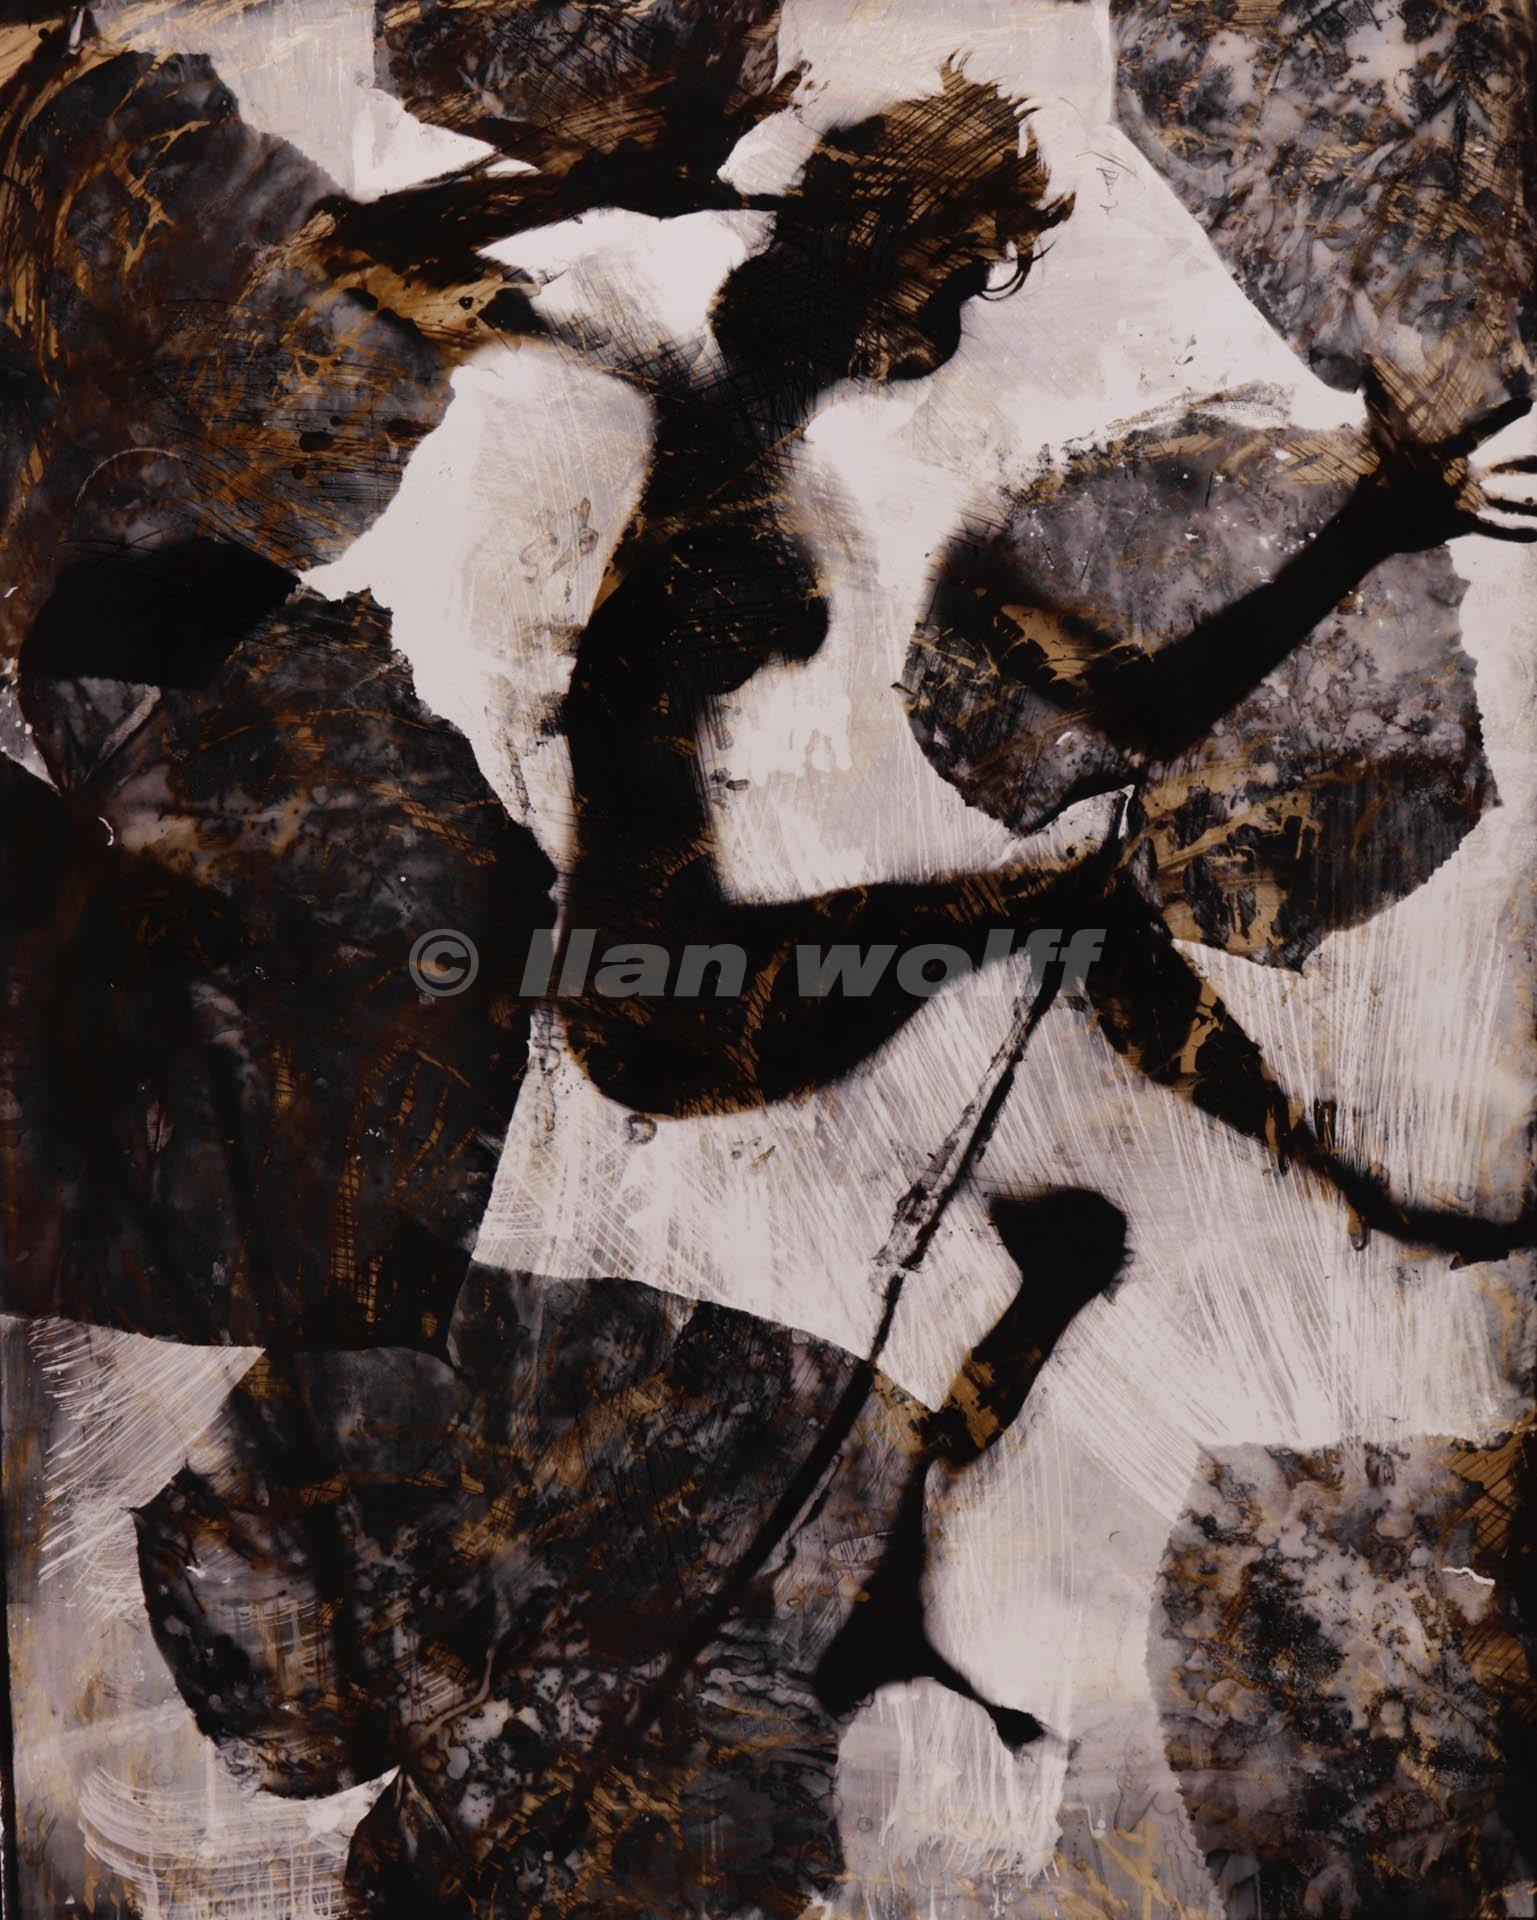 Creation 1 (2007) - Ilan Wolff